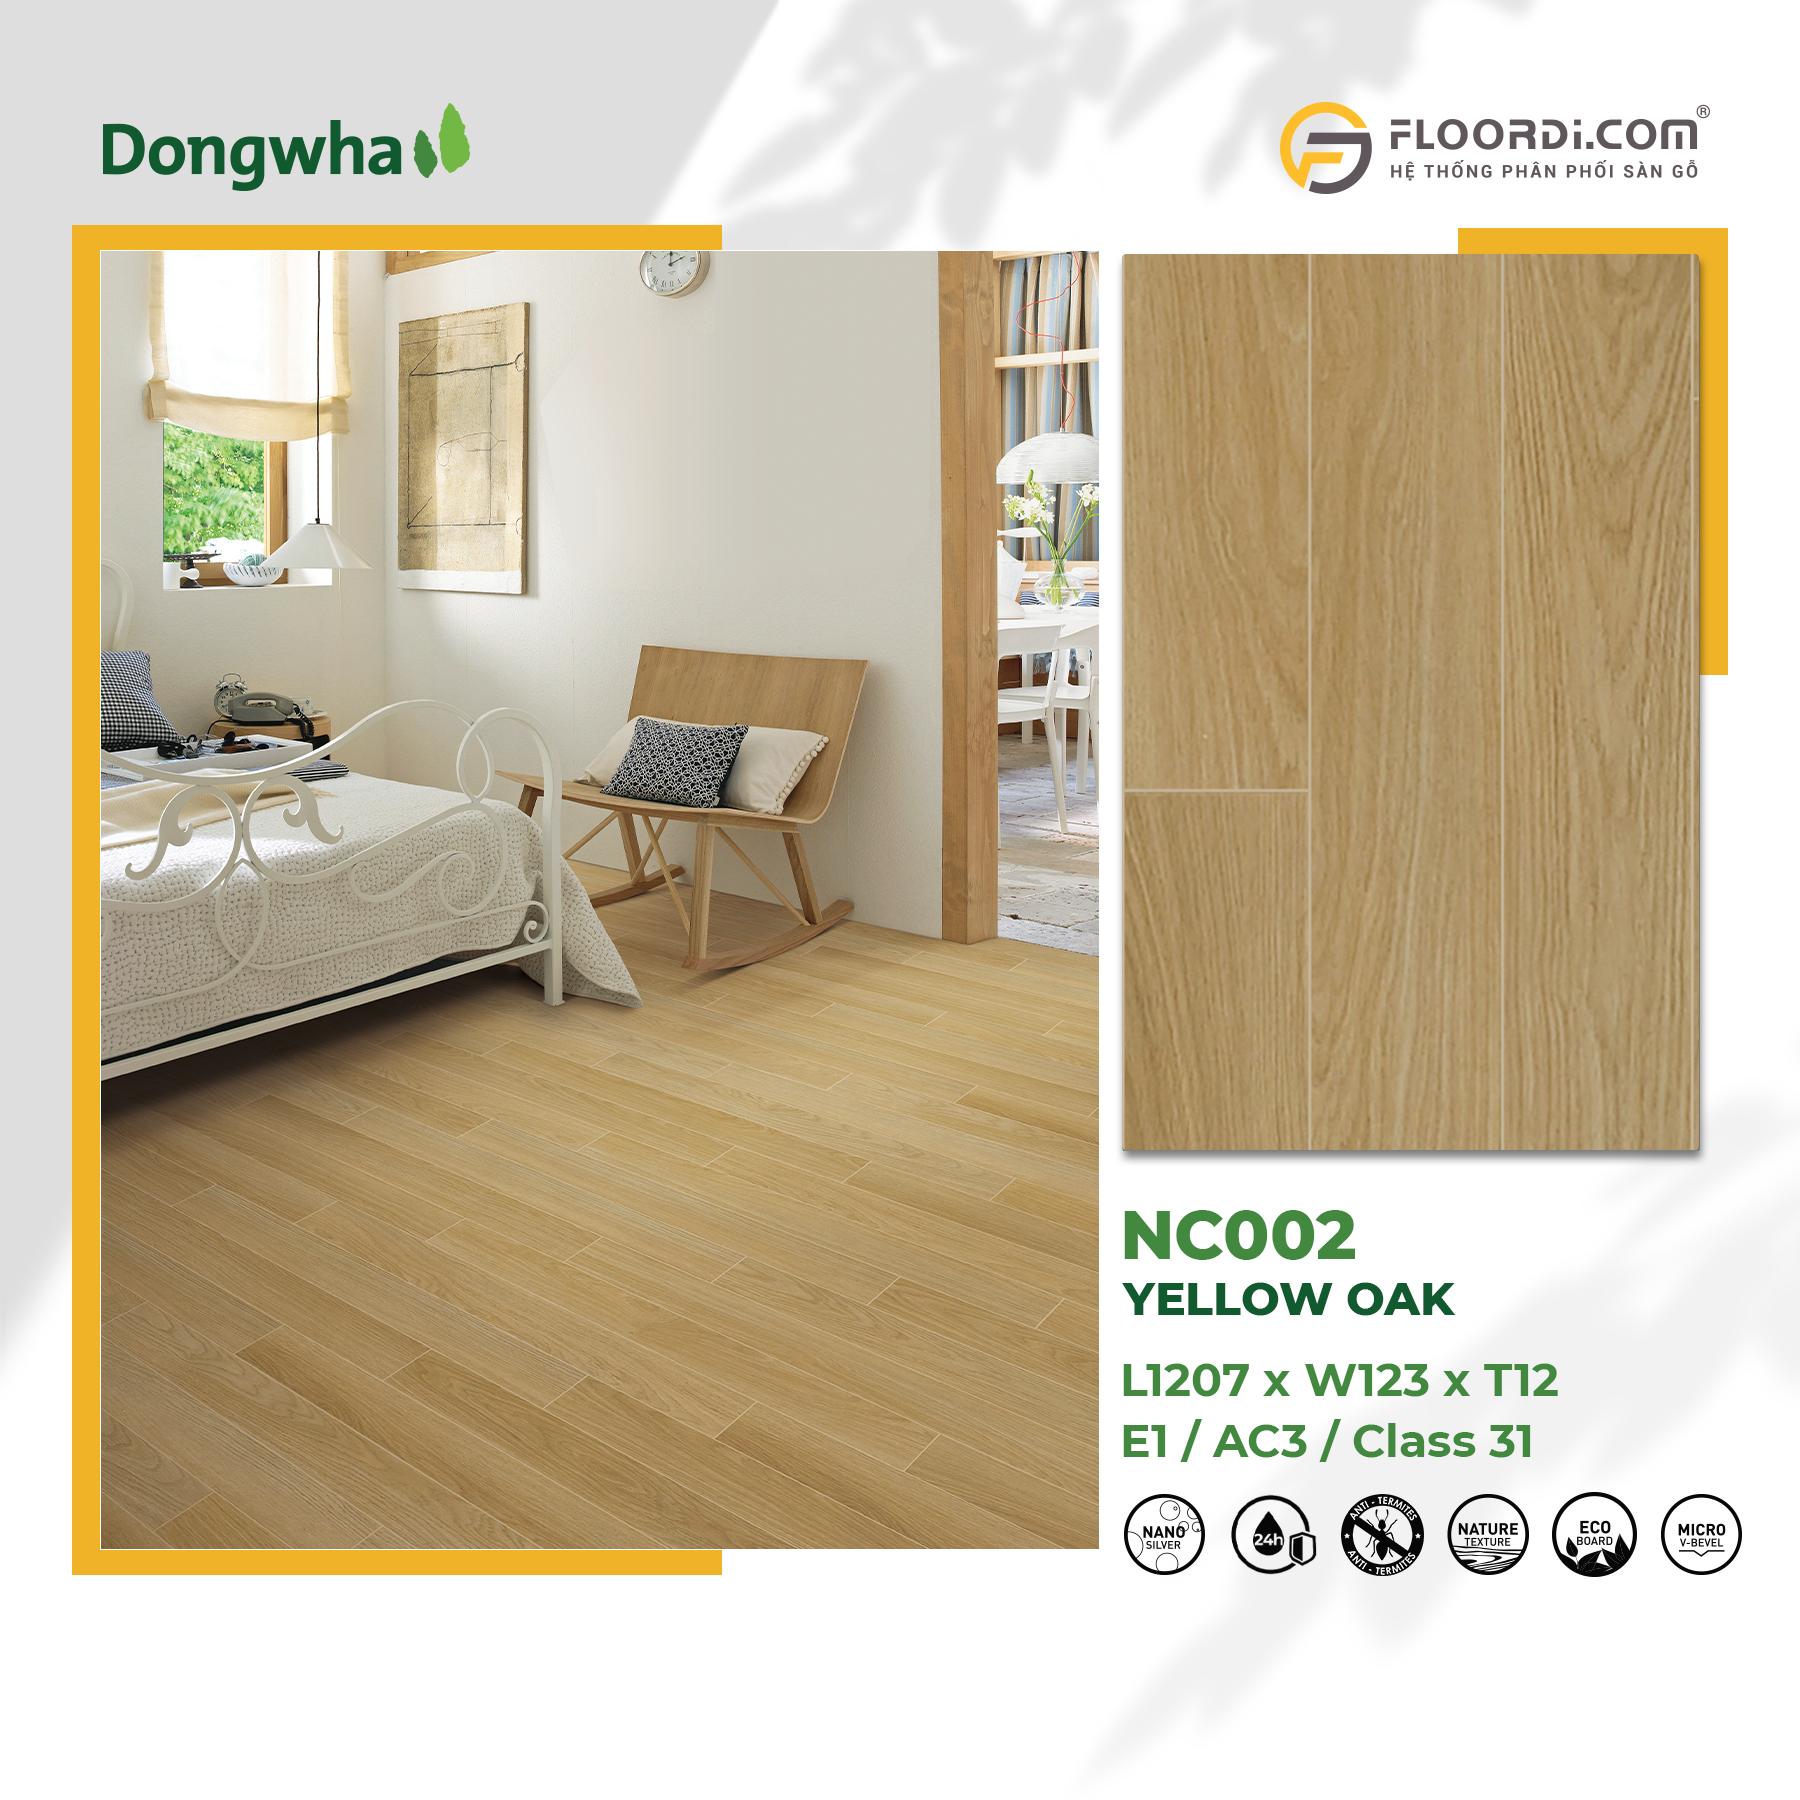 Album Dongwha 1800x1800 NC002 Yellow Oak 052021